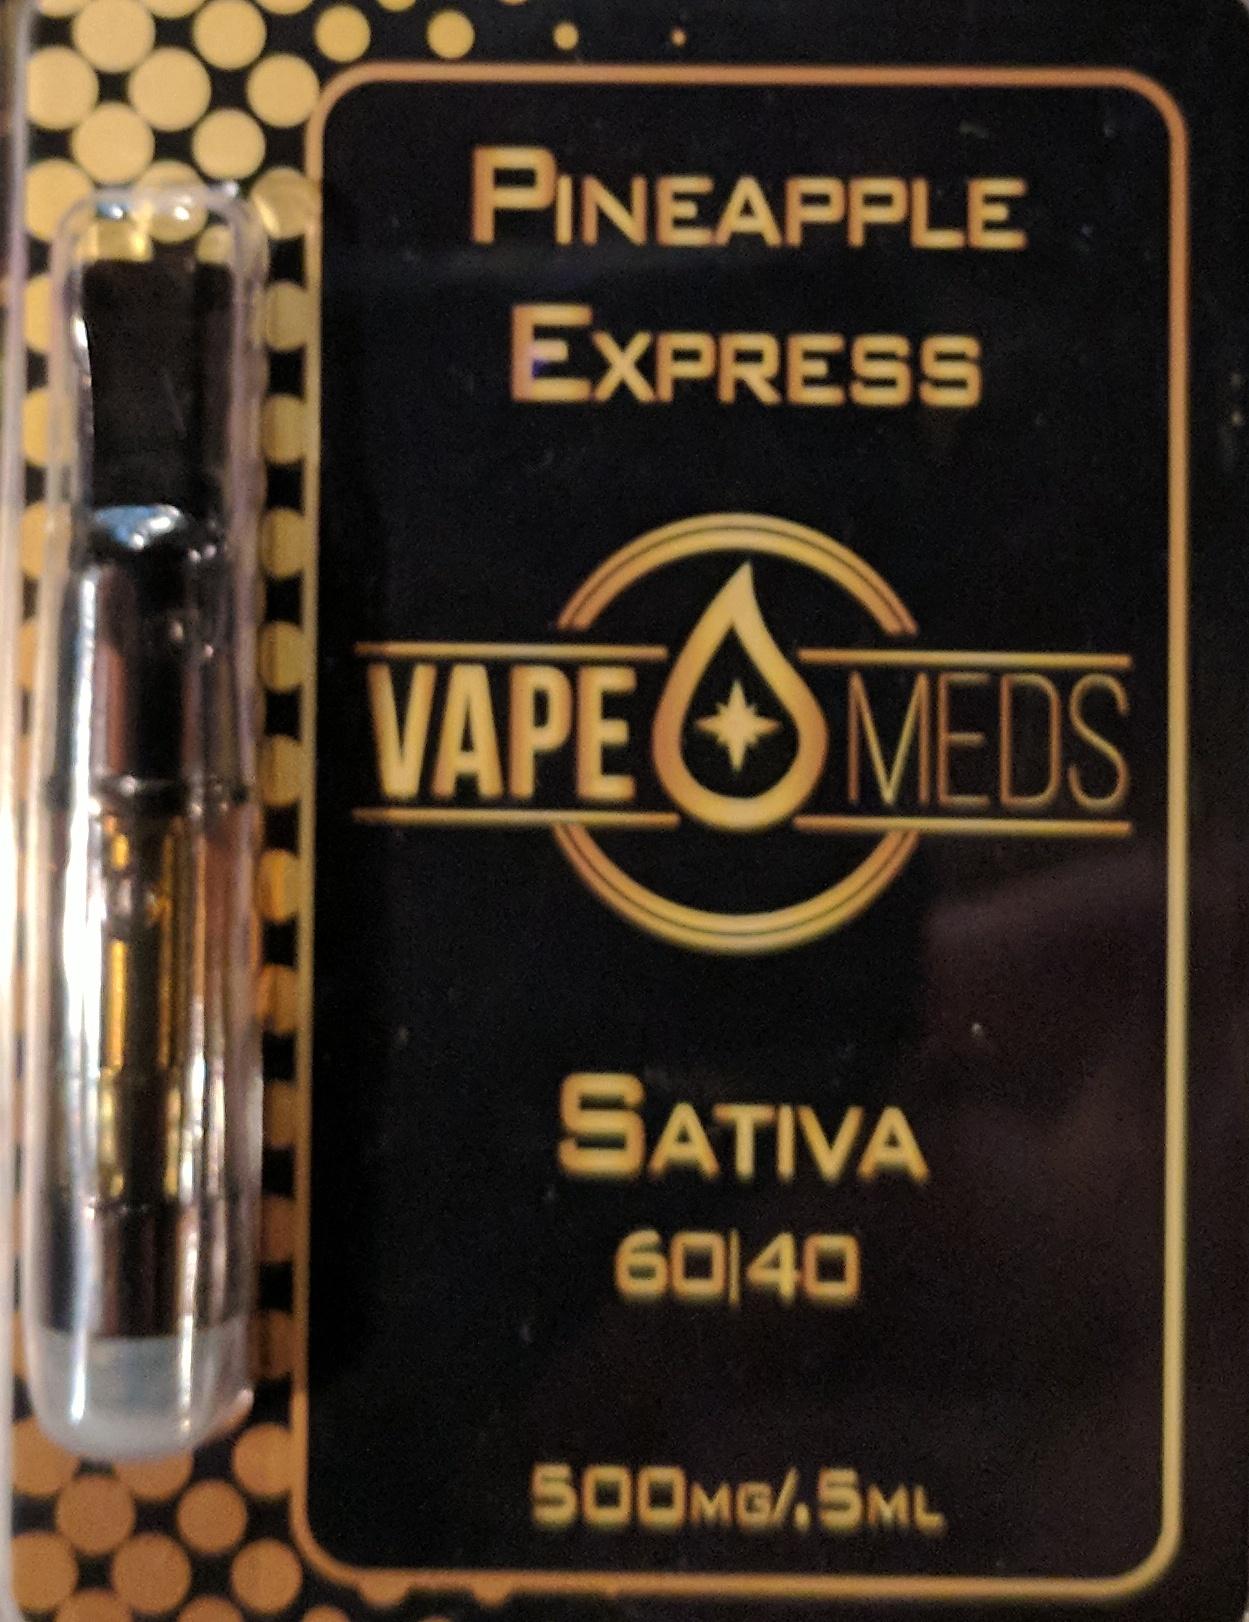 Vape Meds - Pineapples Express (FREE) Product image